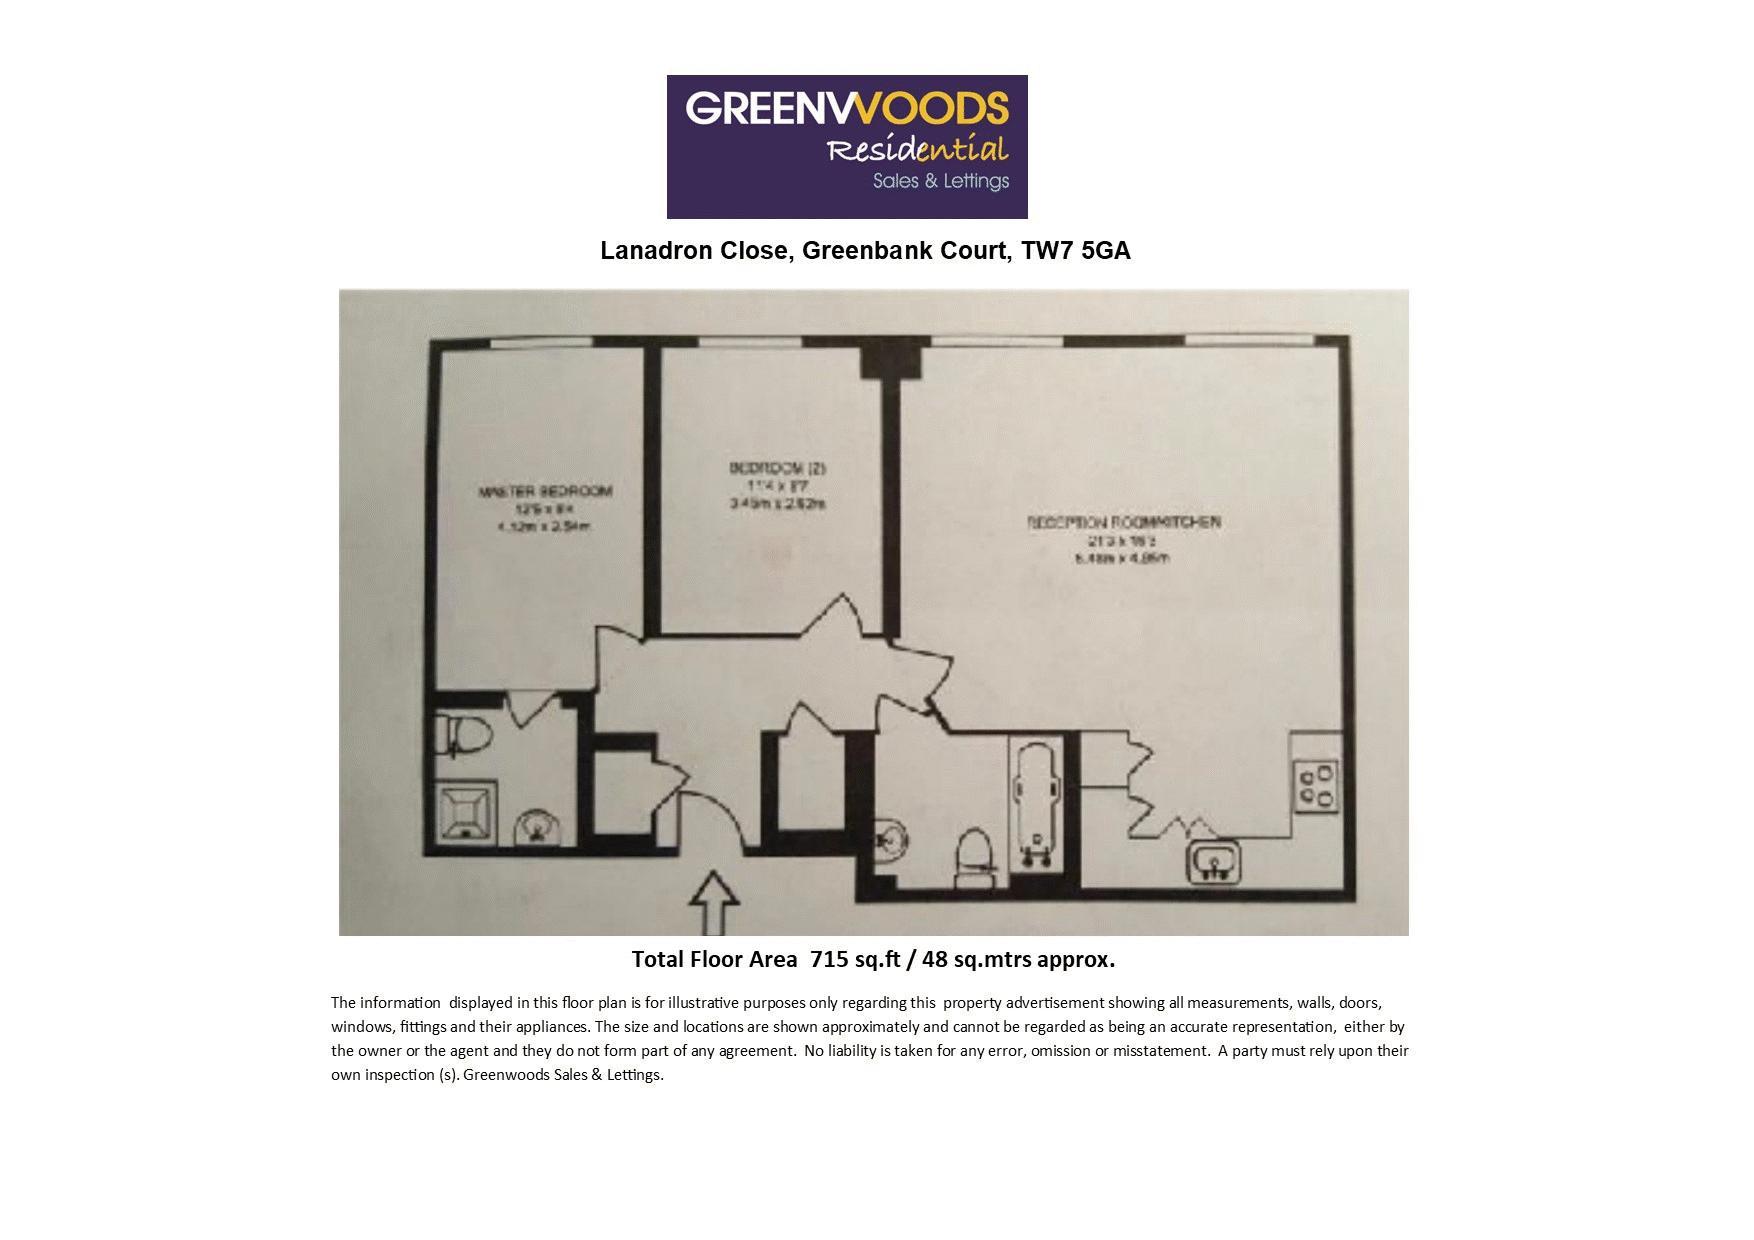 2 D Floorplan Greenbank - GRP